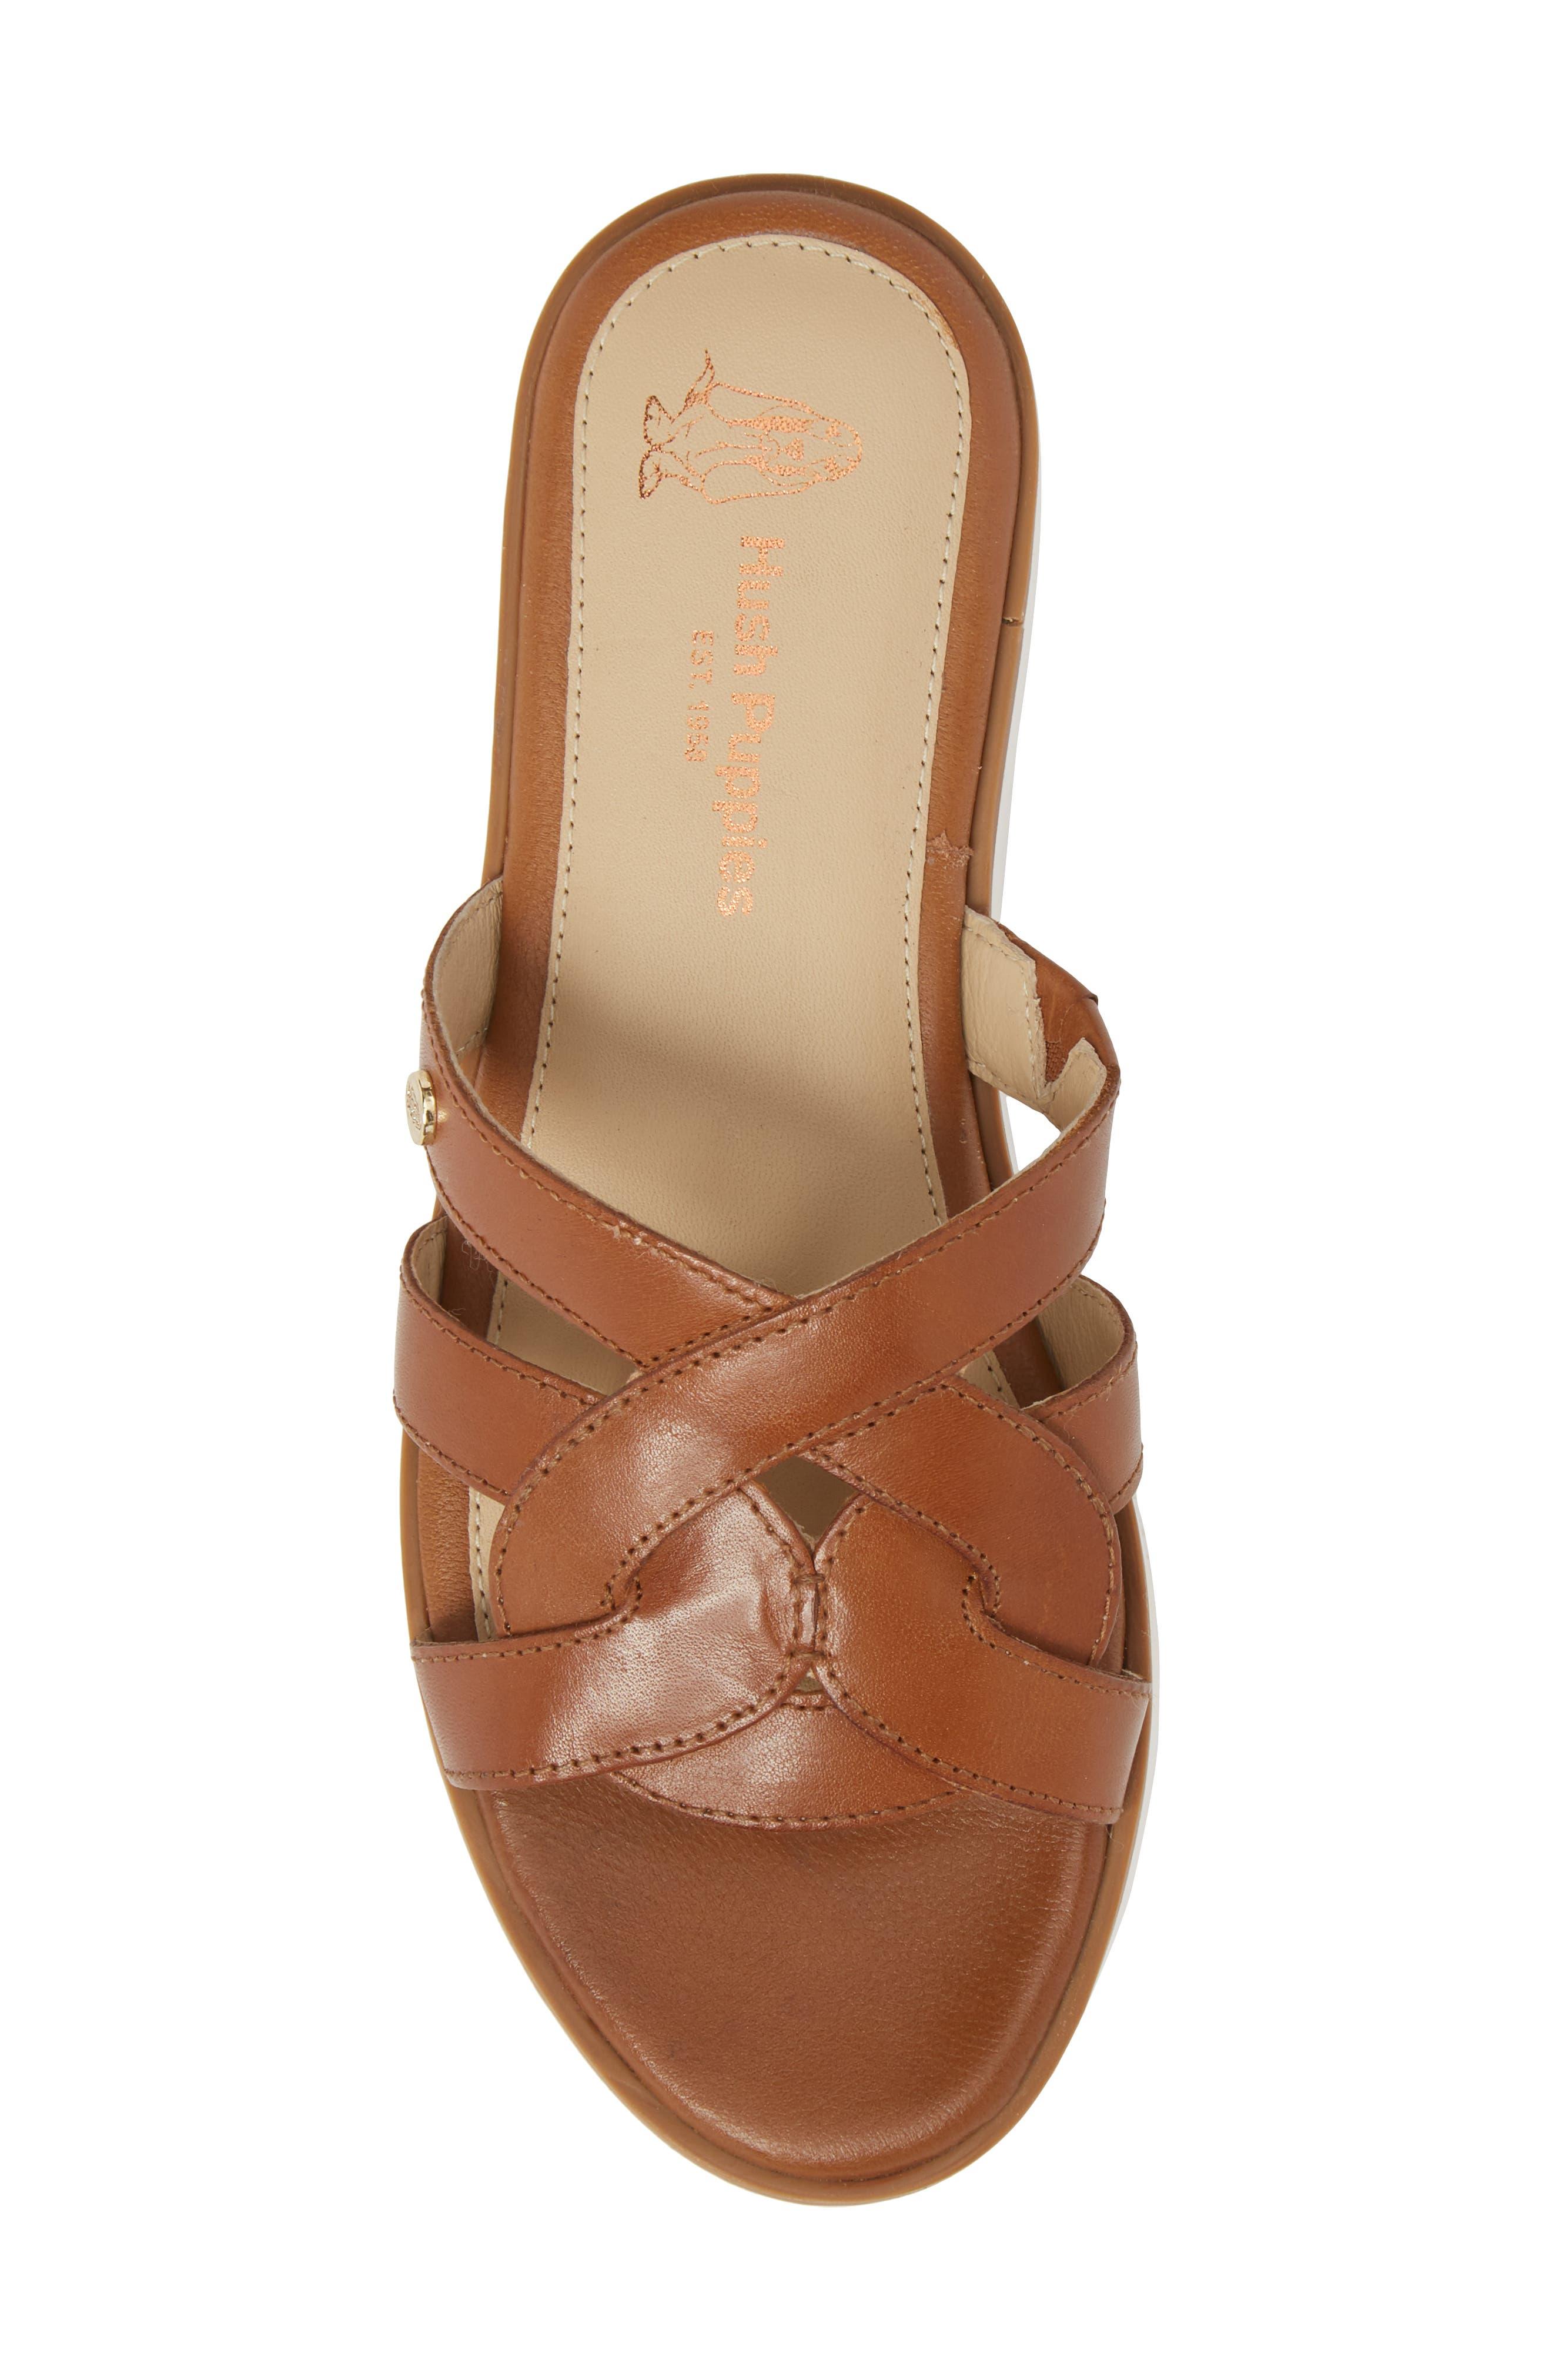 Braid Slide Sandal,                             Alternate thumbnail 5, color,                             Tan Leather